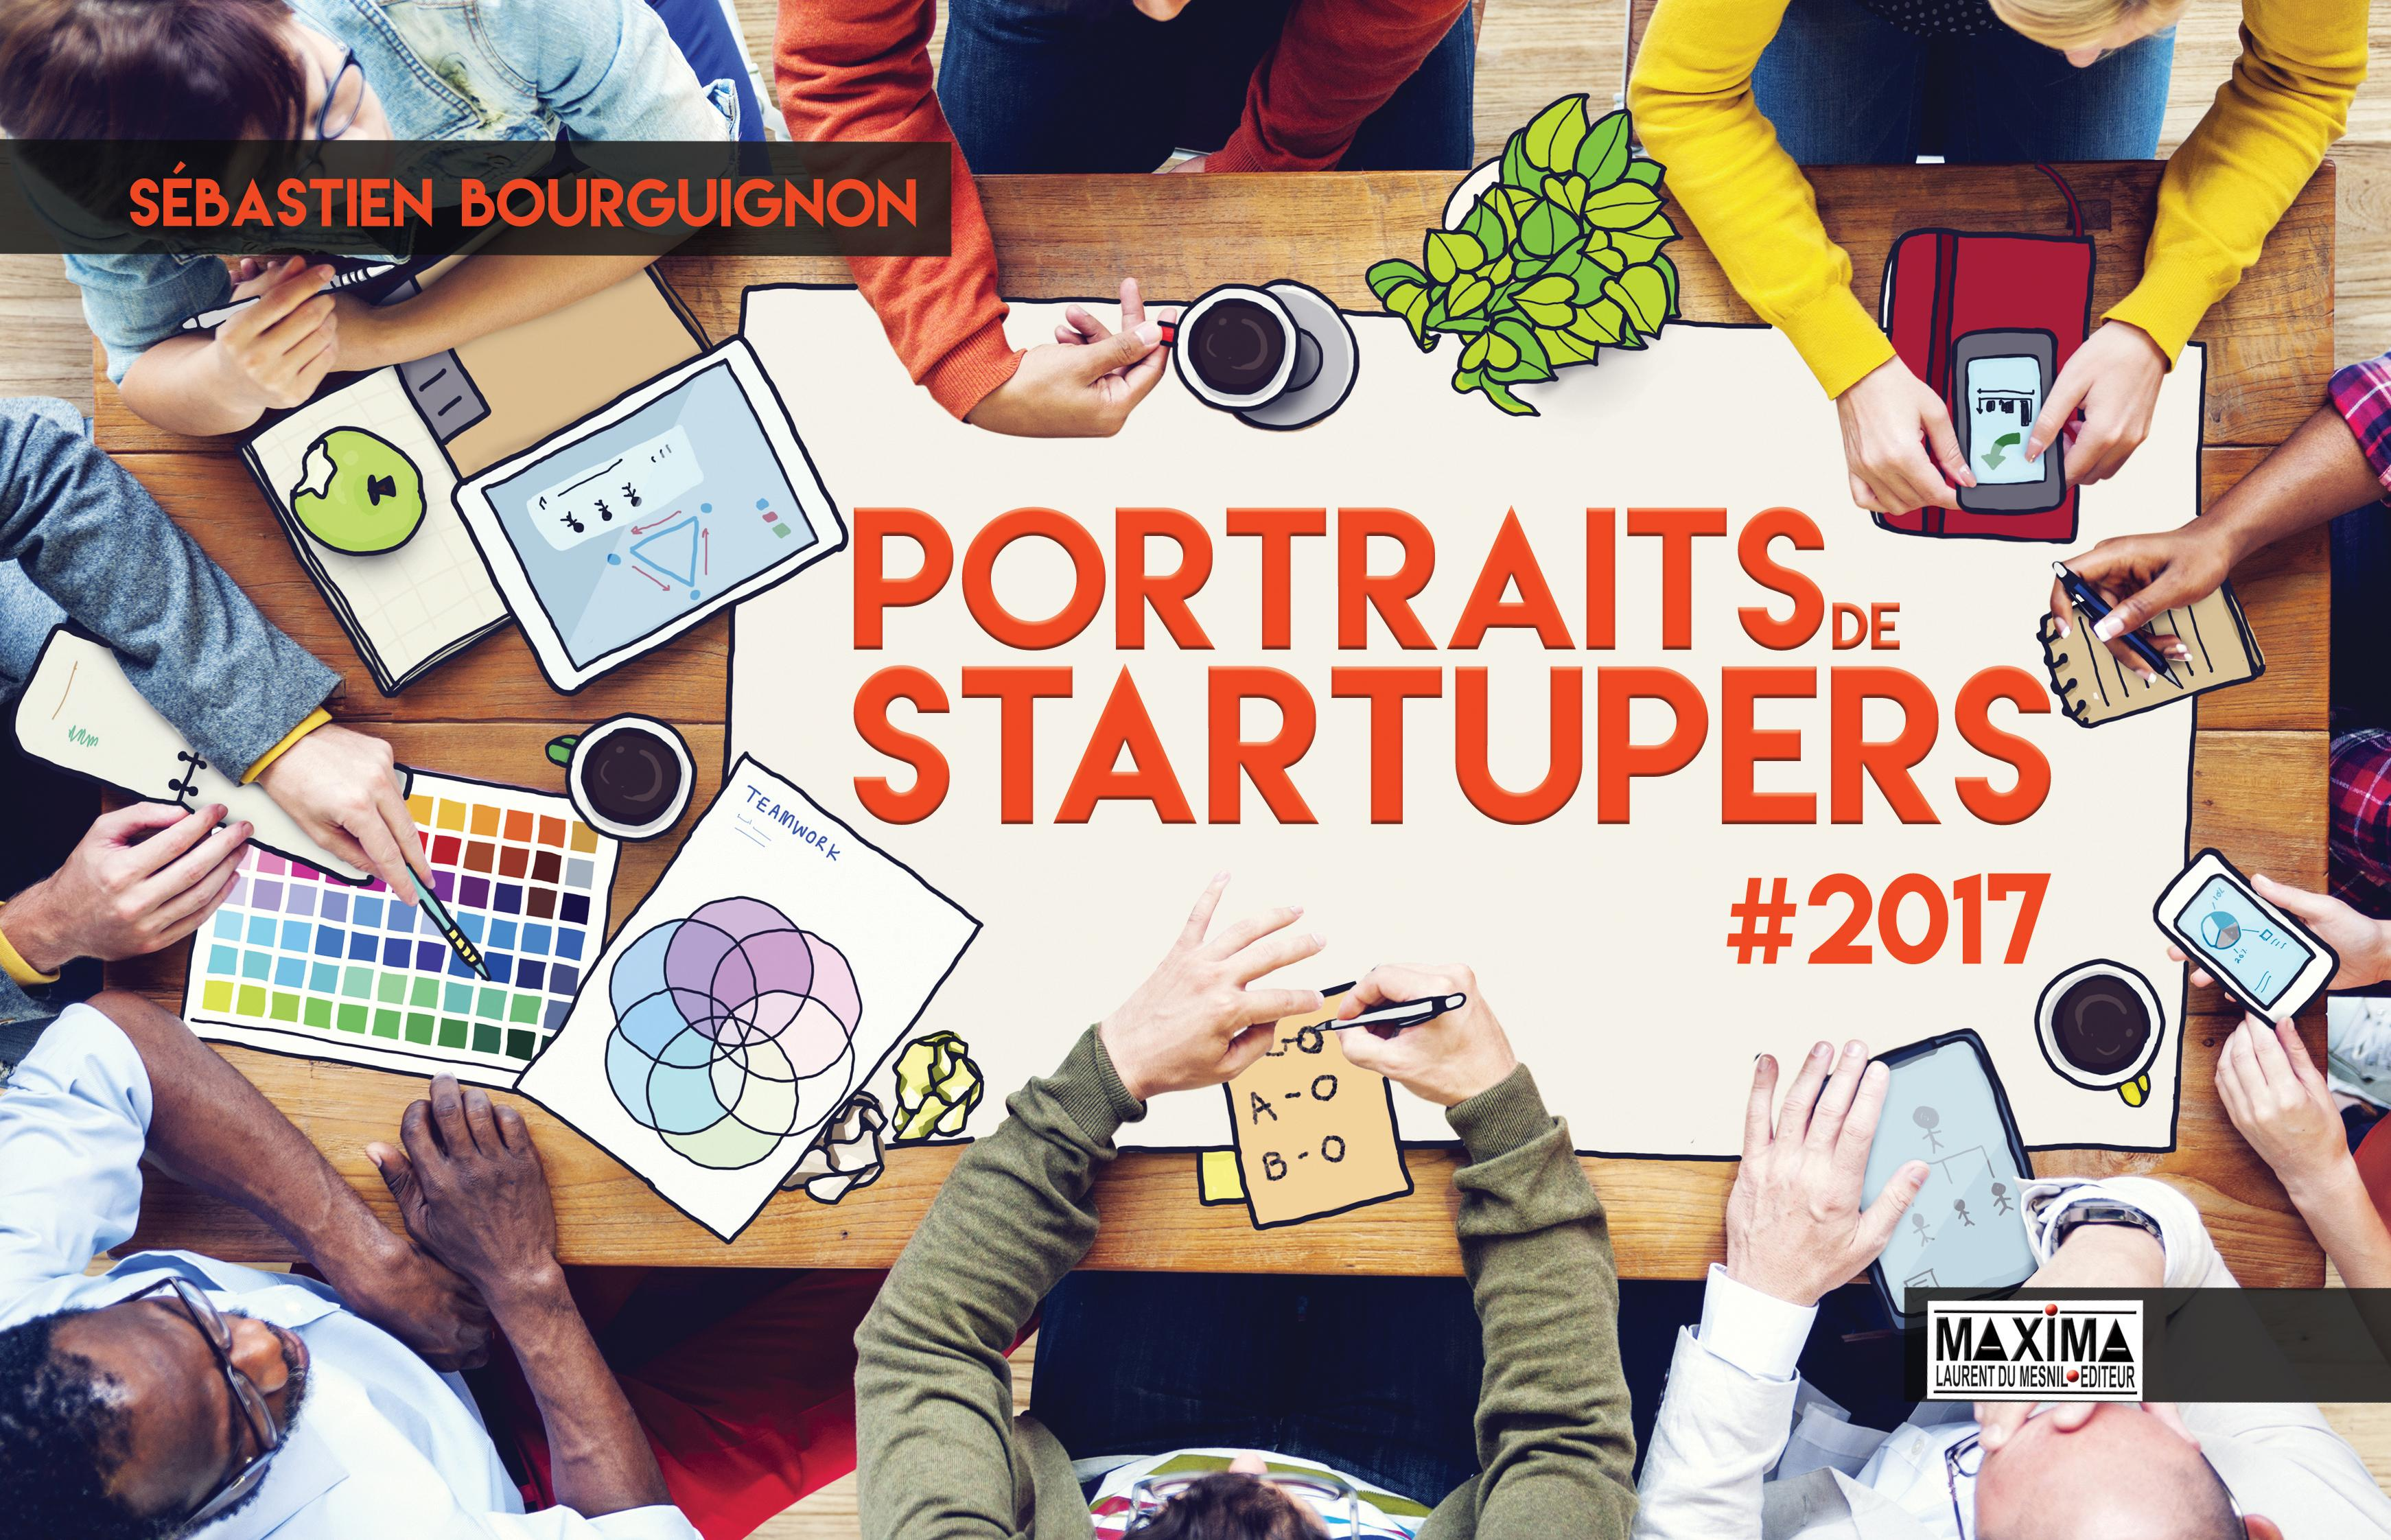 Portraits de startupers, # 2017